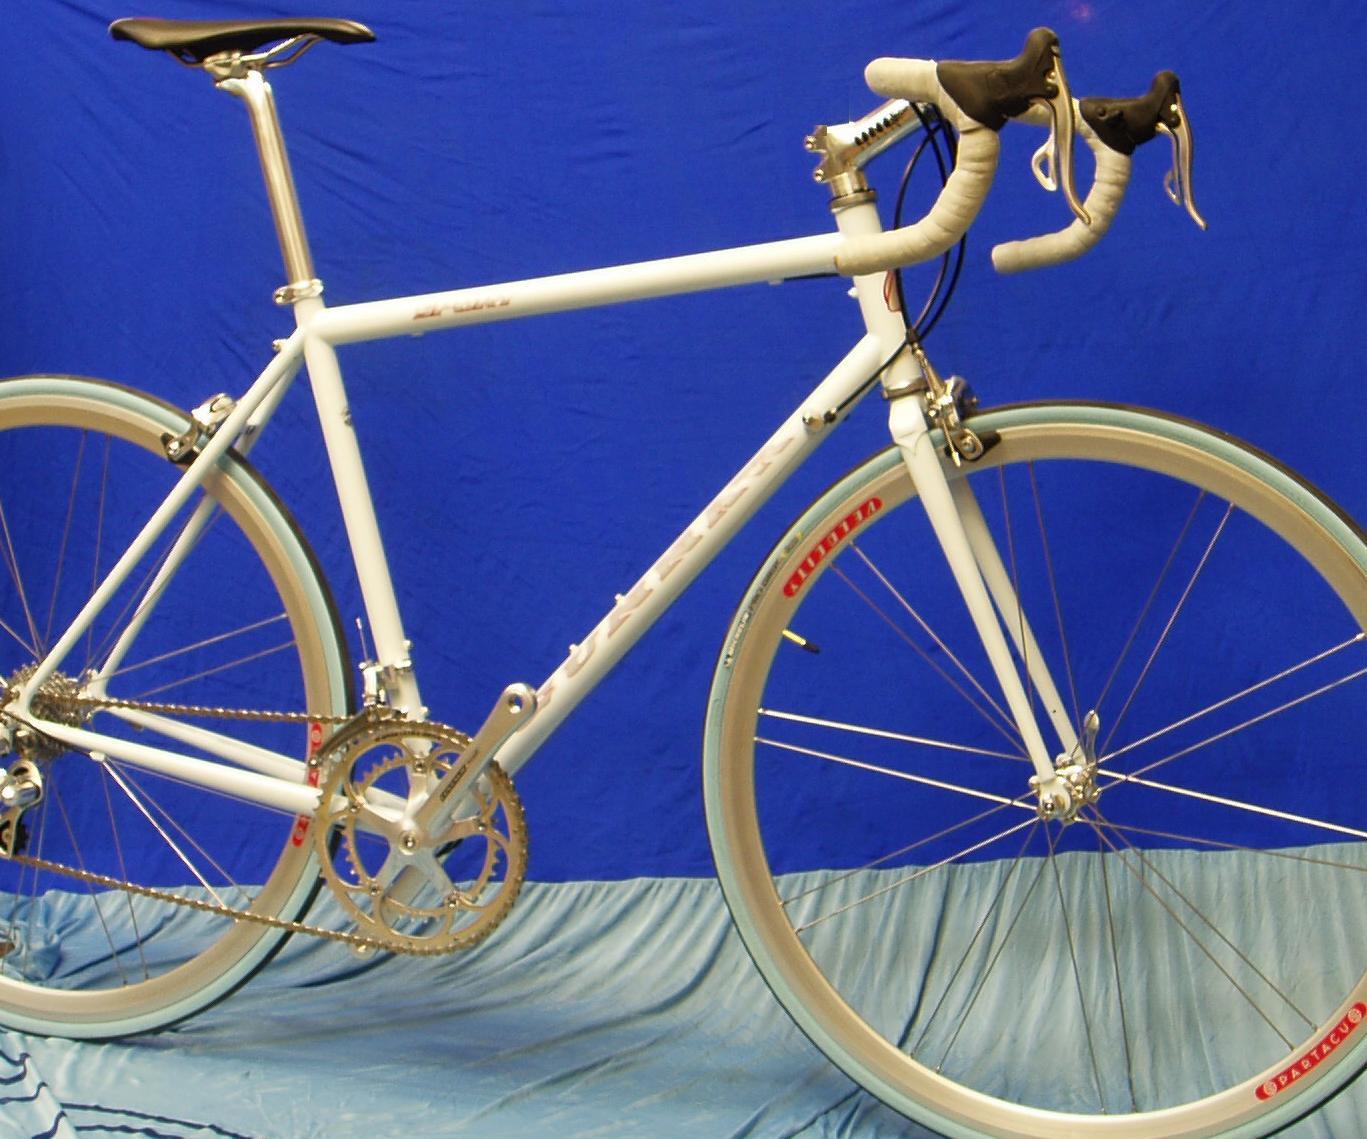 New Gunnar bikes bring smiles